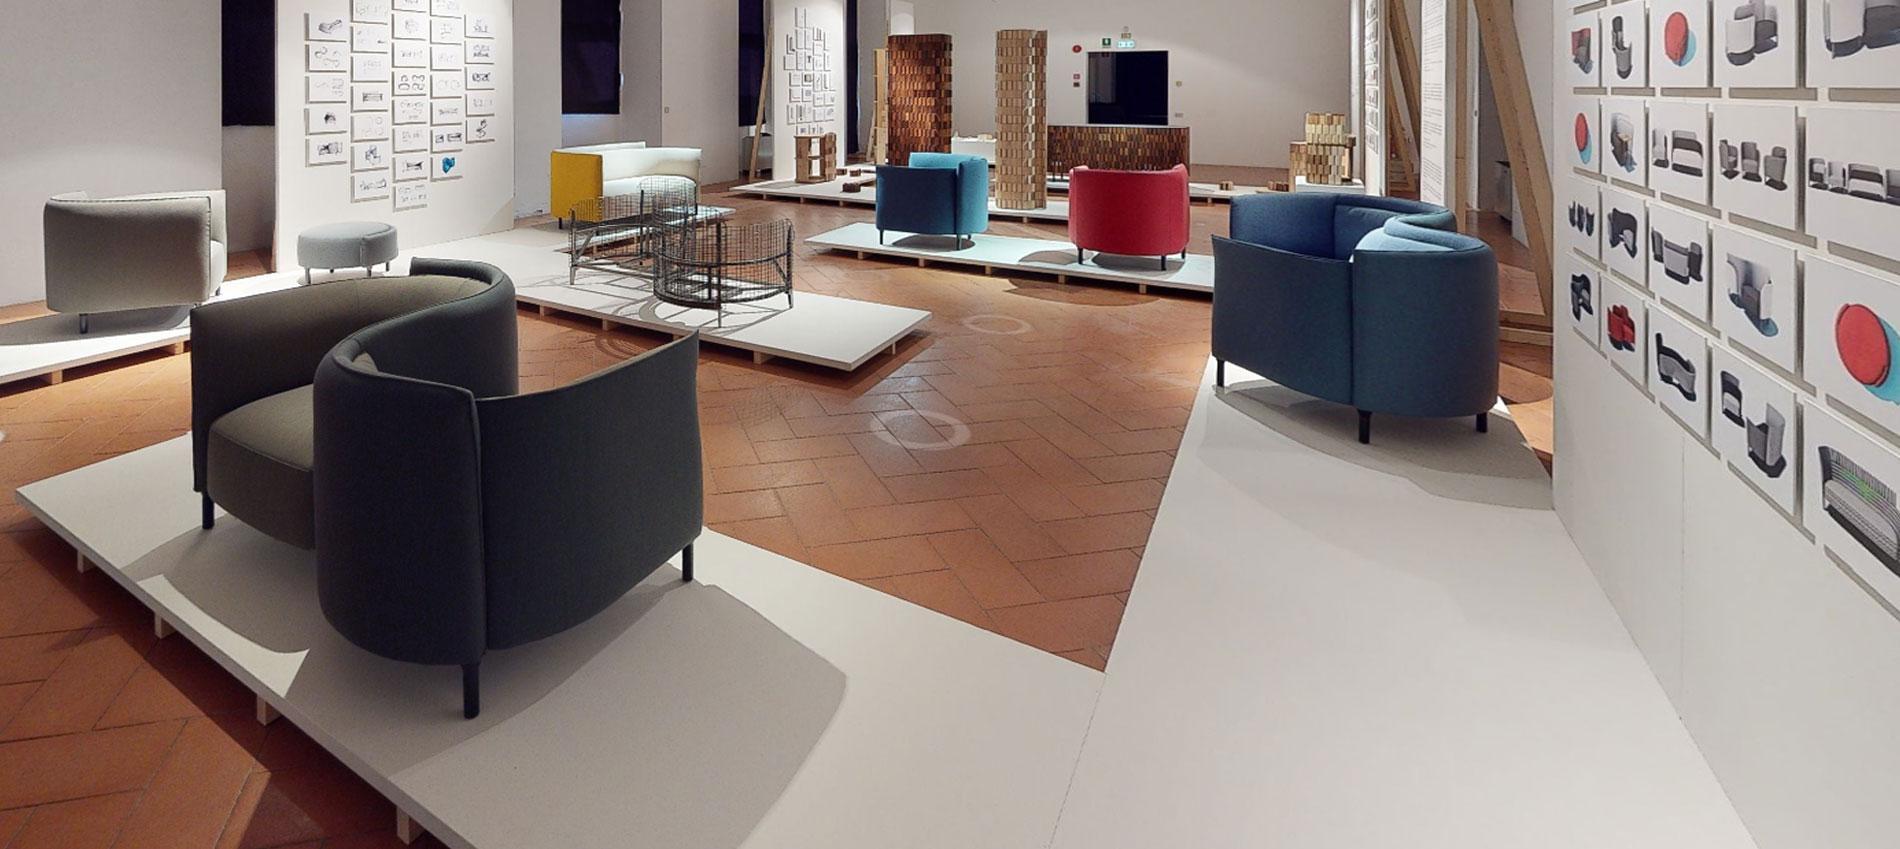 Hemicycle exhibition in Milan Ligne Roset